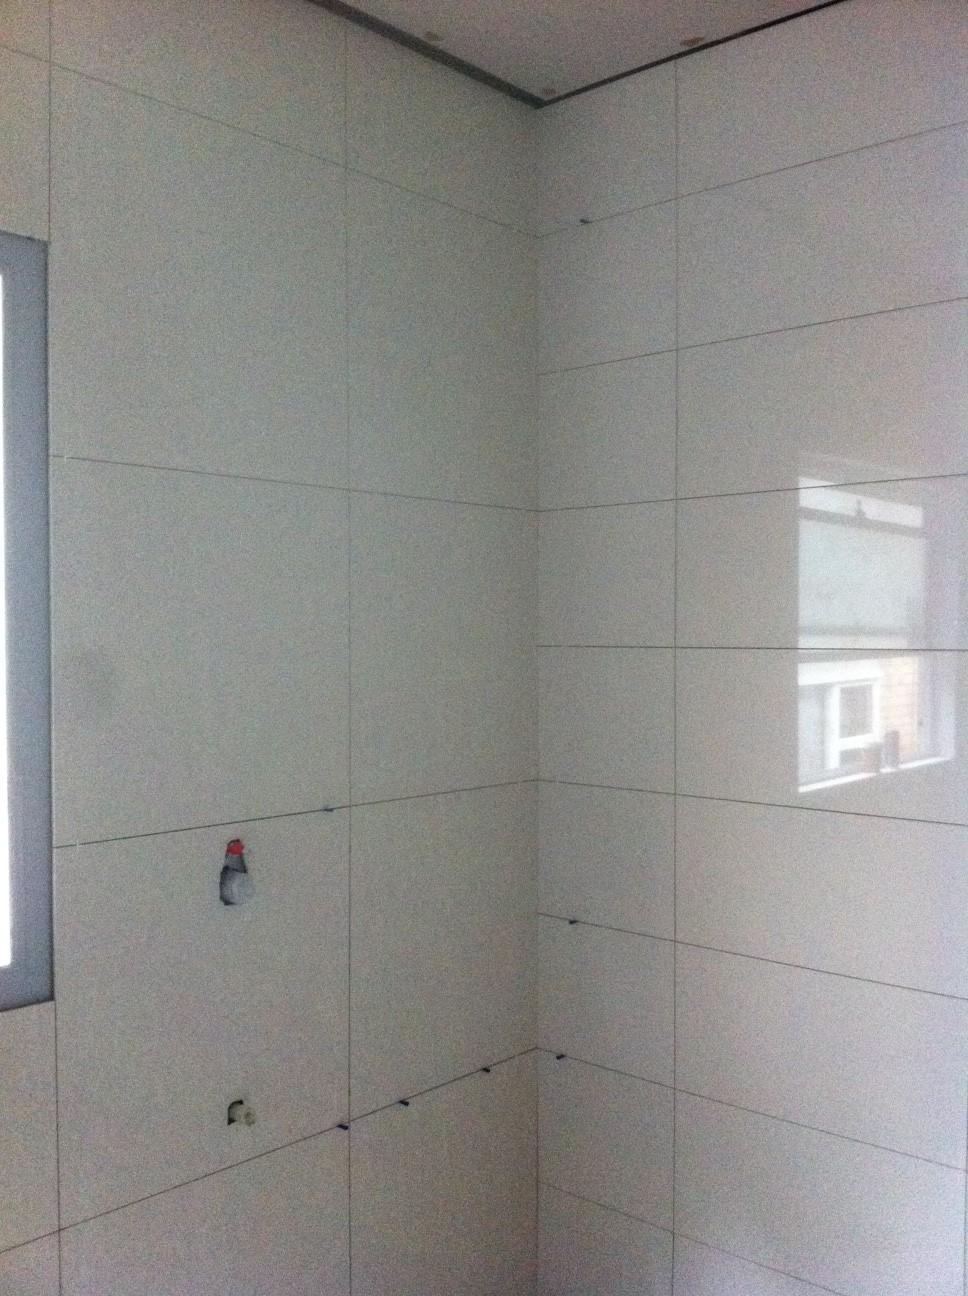 600x600 ceiling tiles choice image tile flooring design ideas 600x600 ceiling tiles images tile flooring design ideas 100 600x600 ceiling tiles best 25 floor tiles doublecrazyfo Images